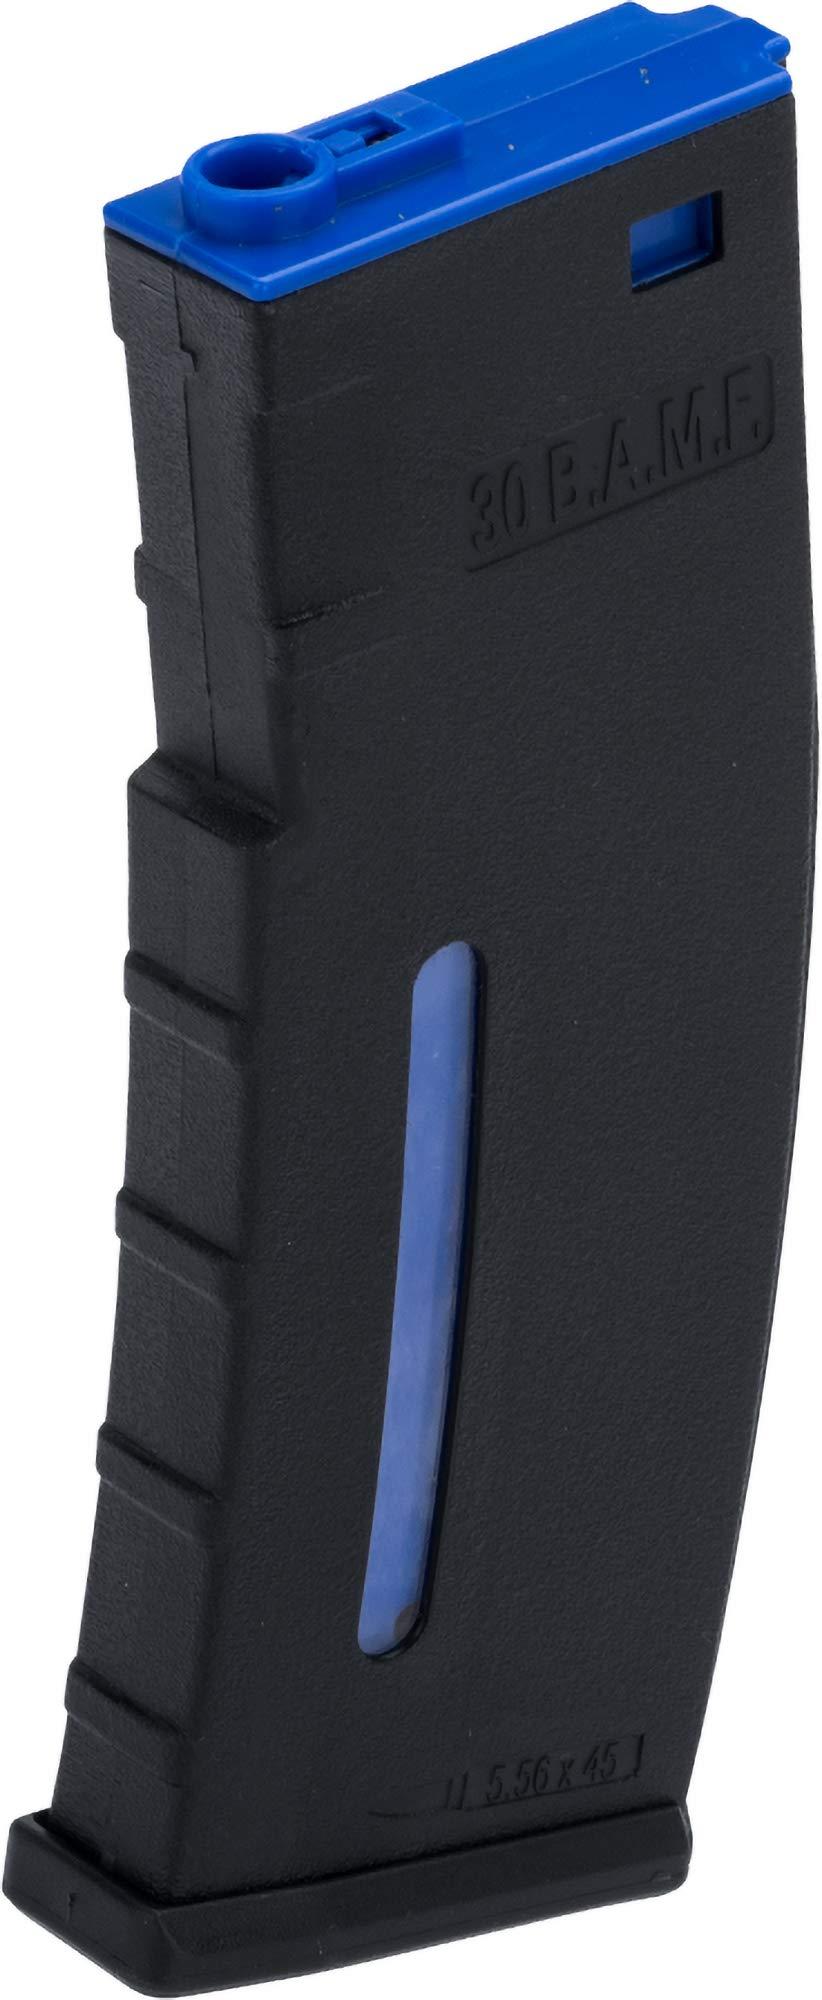 Evike BAMF 30rd Polymer Mil-Sim Airsoft Magazine for M4 / M16 Series AEG Rifles (Color: Black & Blue / x1 Single Mag) by Evike